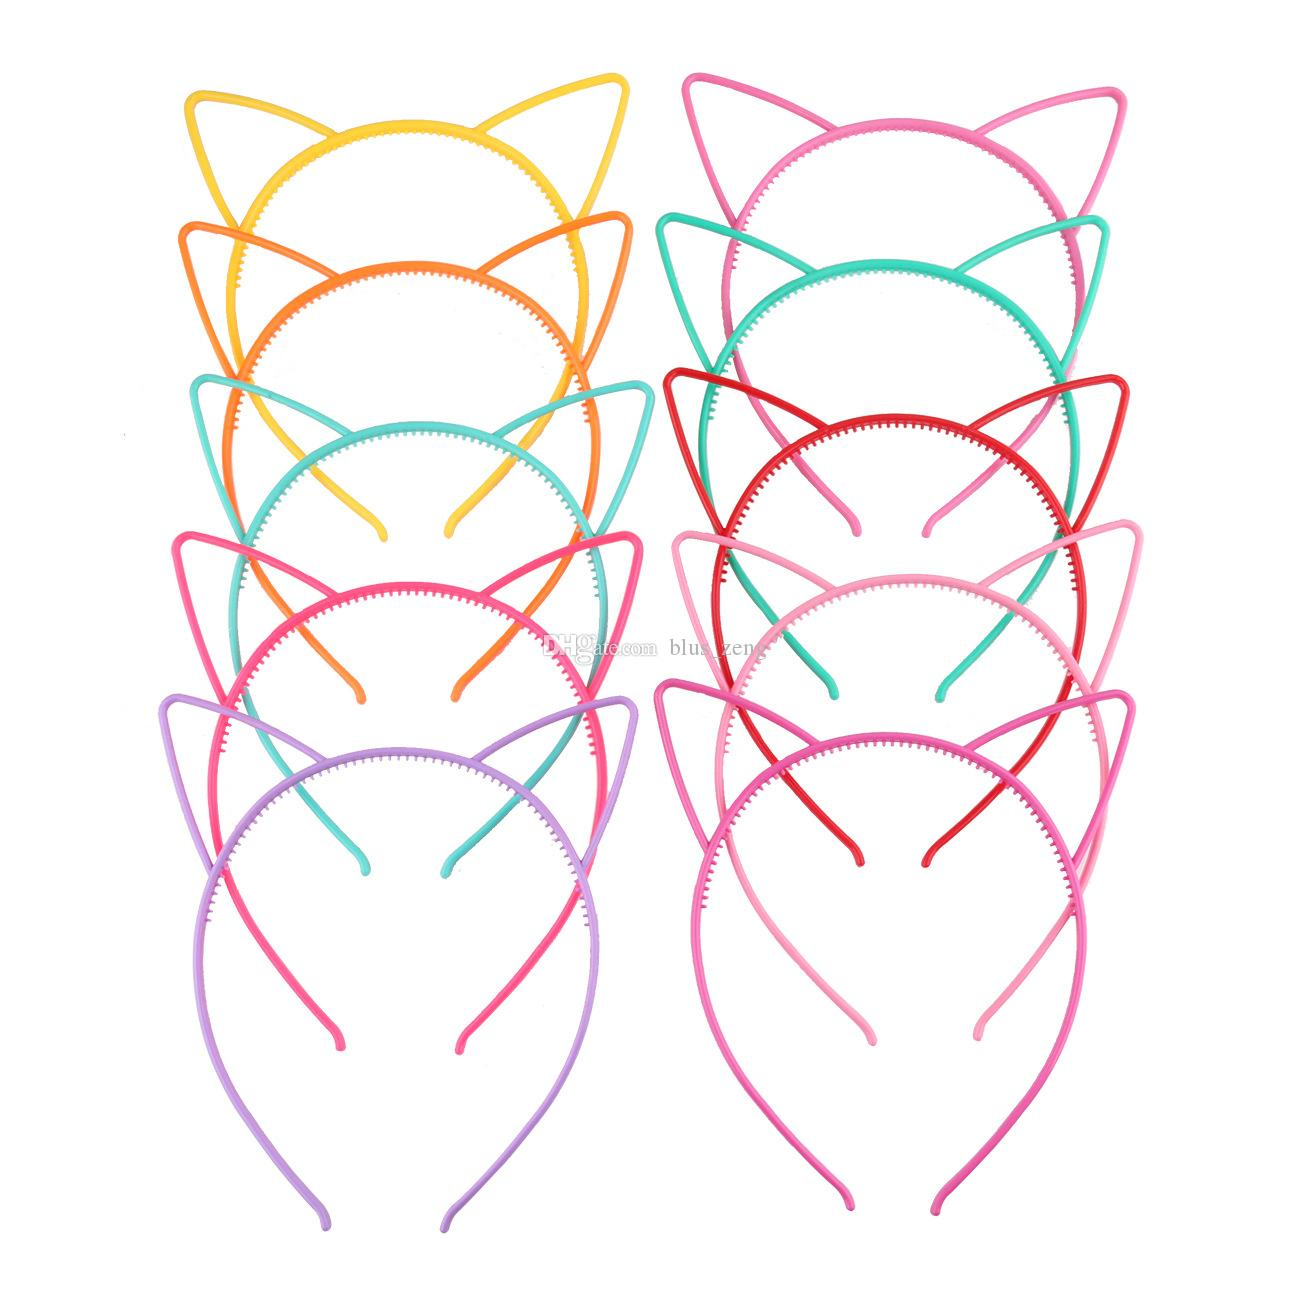 Compre Chicas De Dibujos Animados De Plástico Oreja De Gato Hairband ...